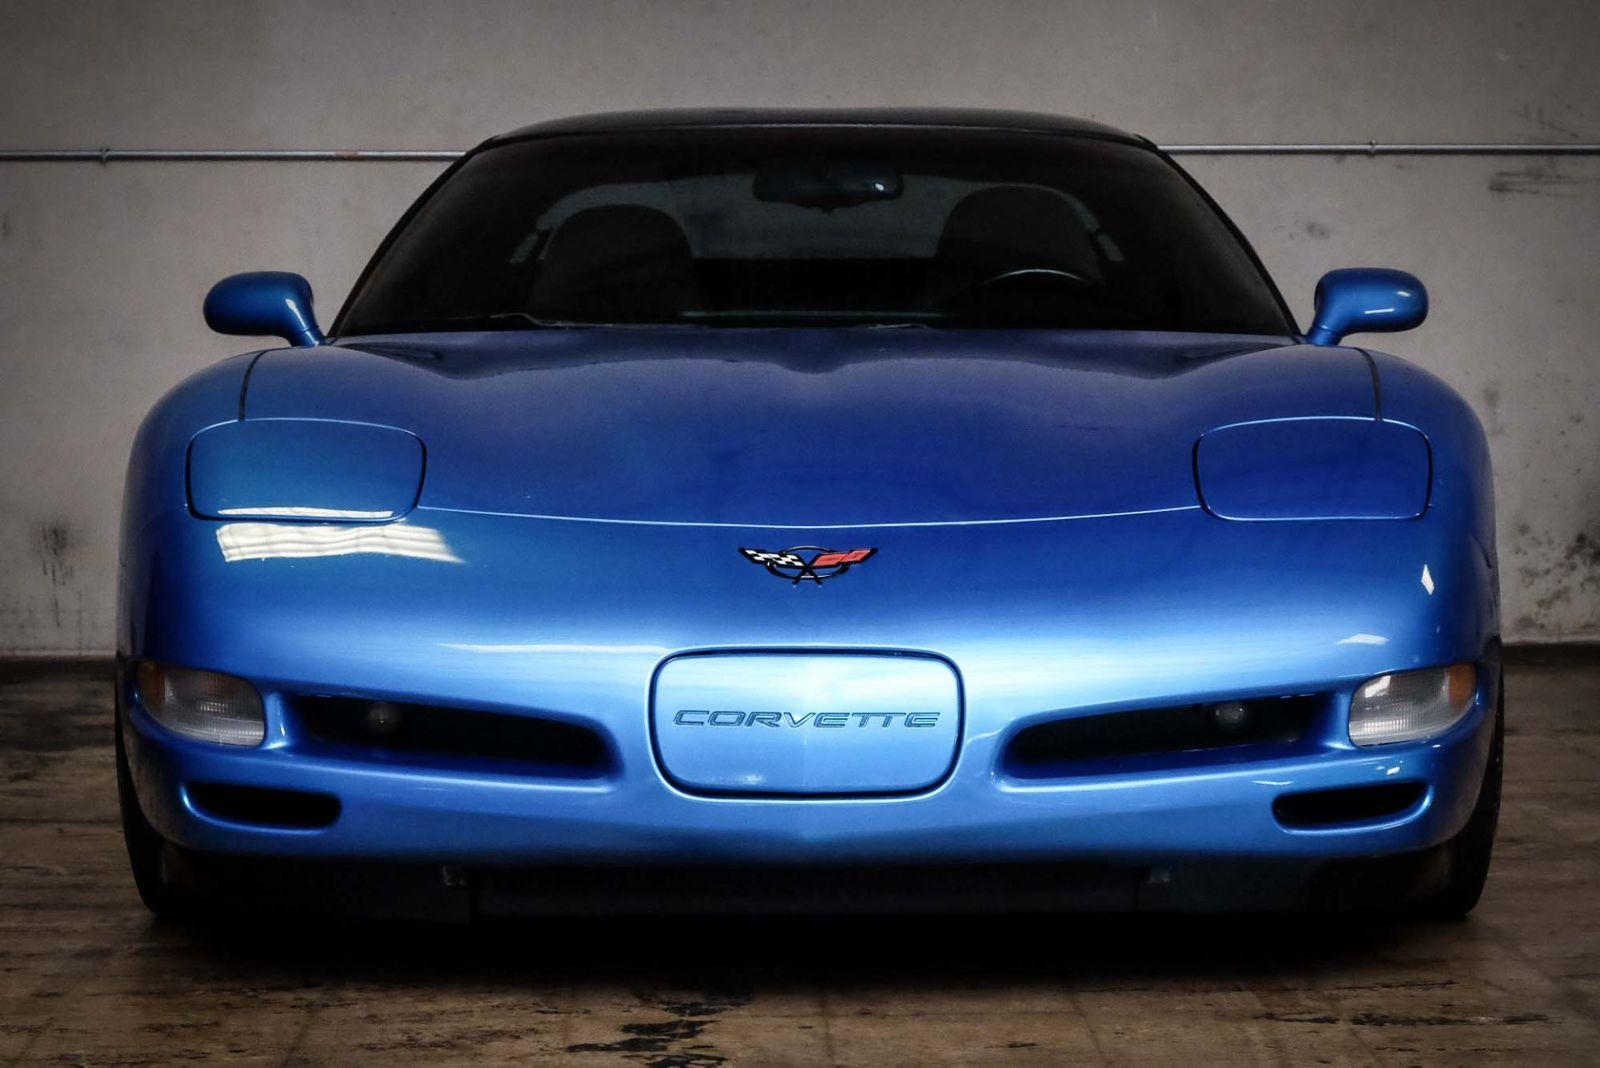 2000 Blue Chevrolet Corvette   | C5 Corvette Photo 3